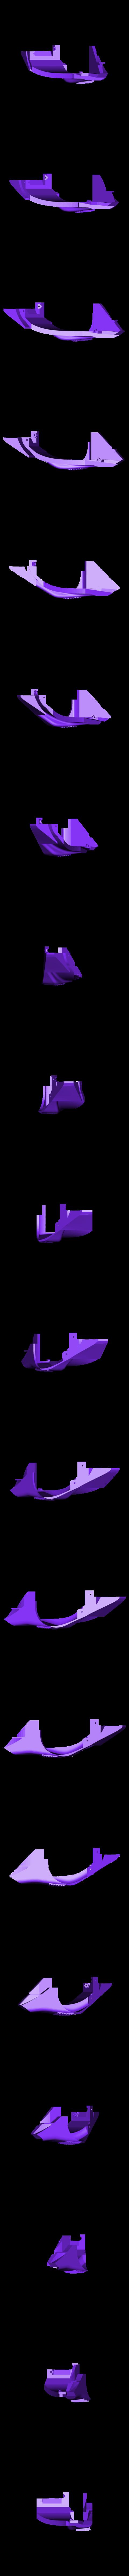 orange front left.stl Download free STL file 1991 Mazda 787B 3d Printed RC Car • 3D printable template, brett